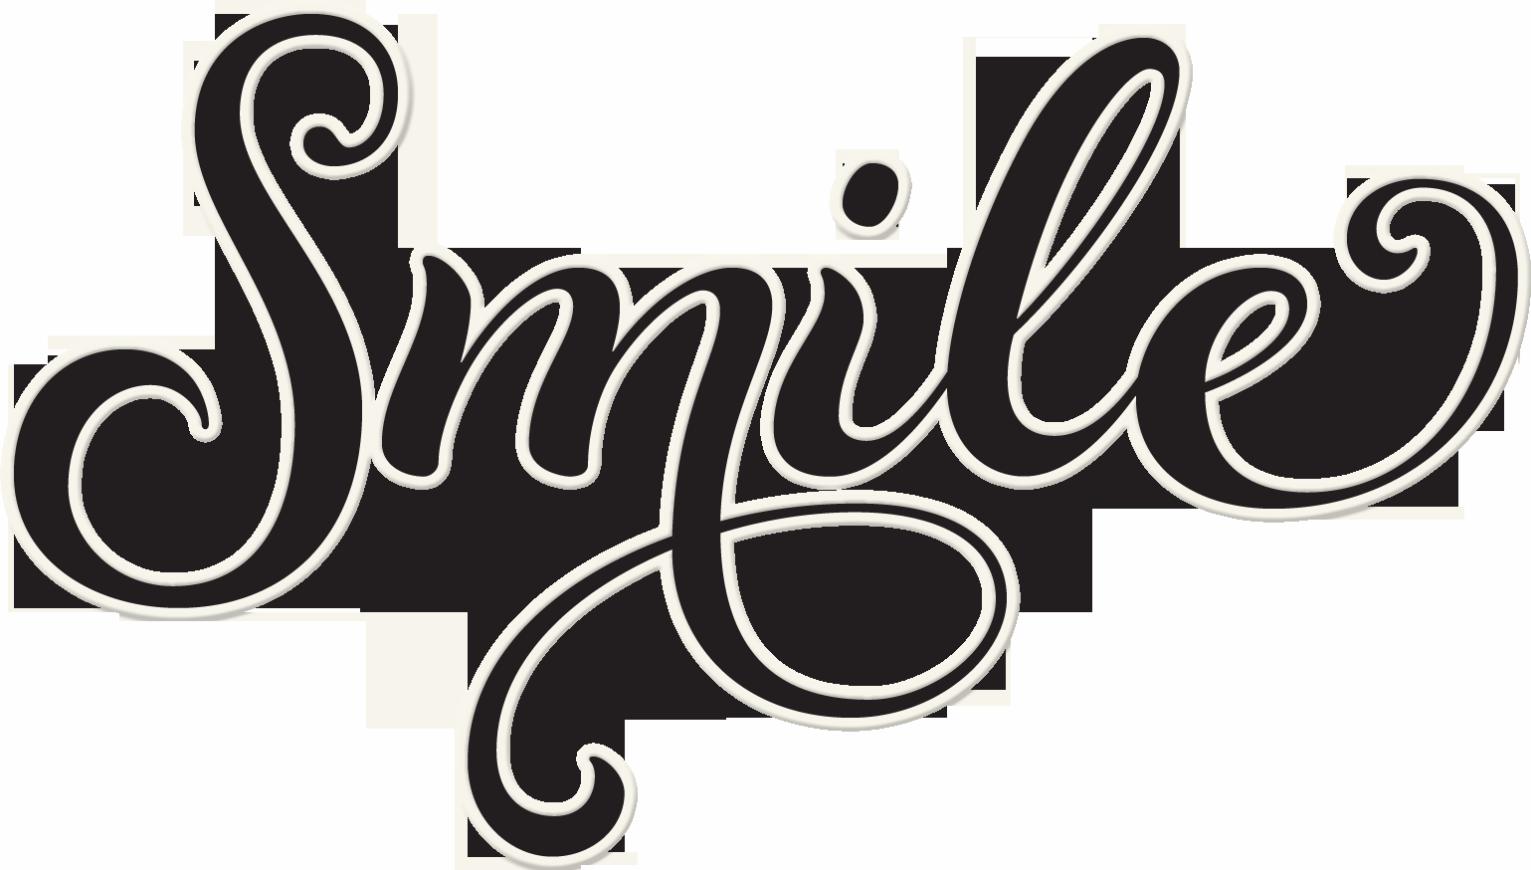 the word smile in cursive - Google Search | Cursive words ...